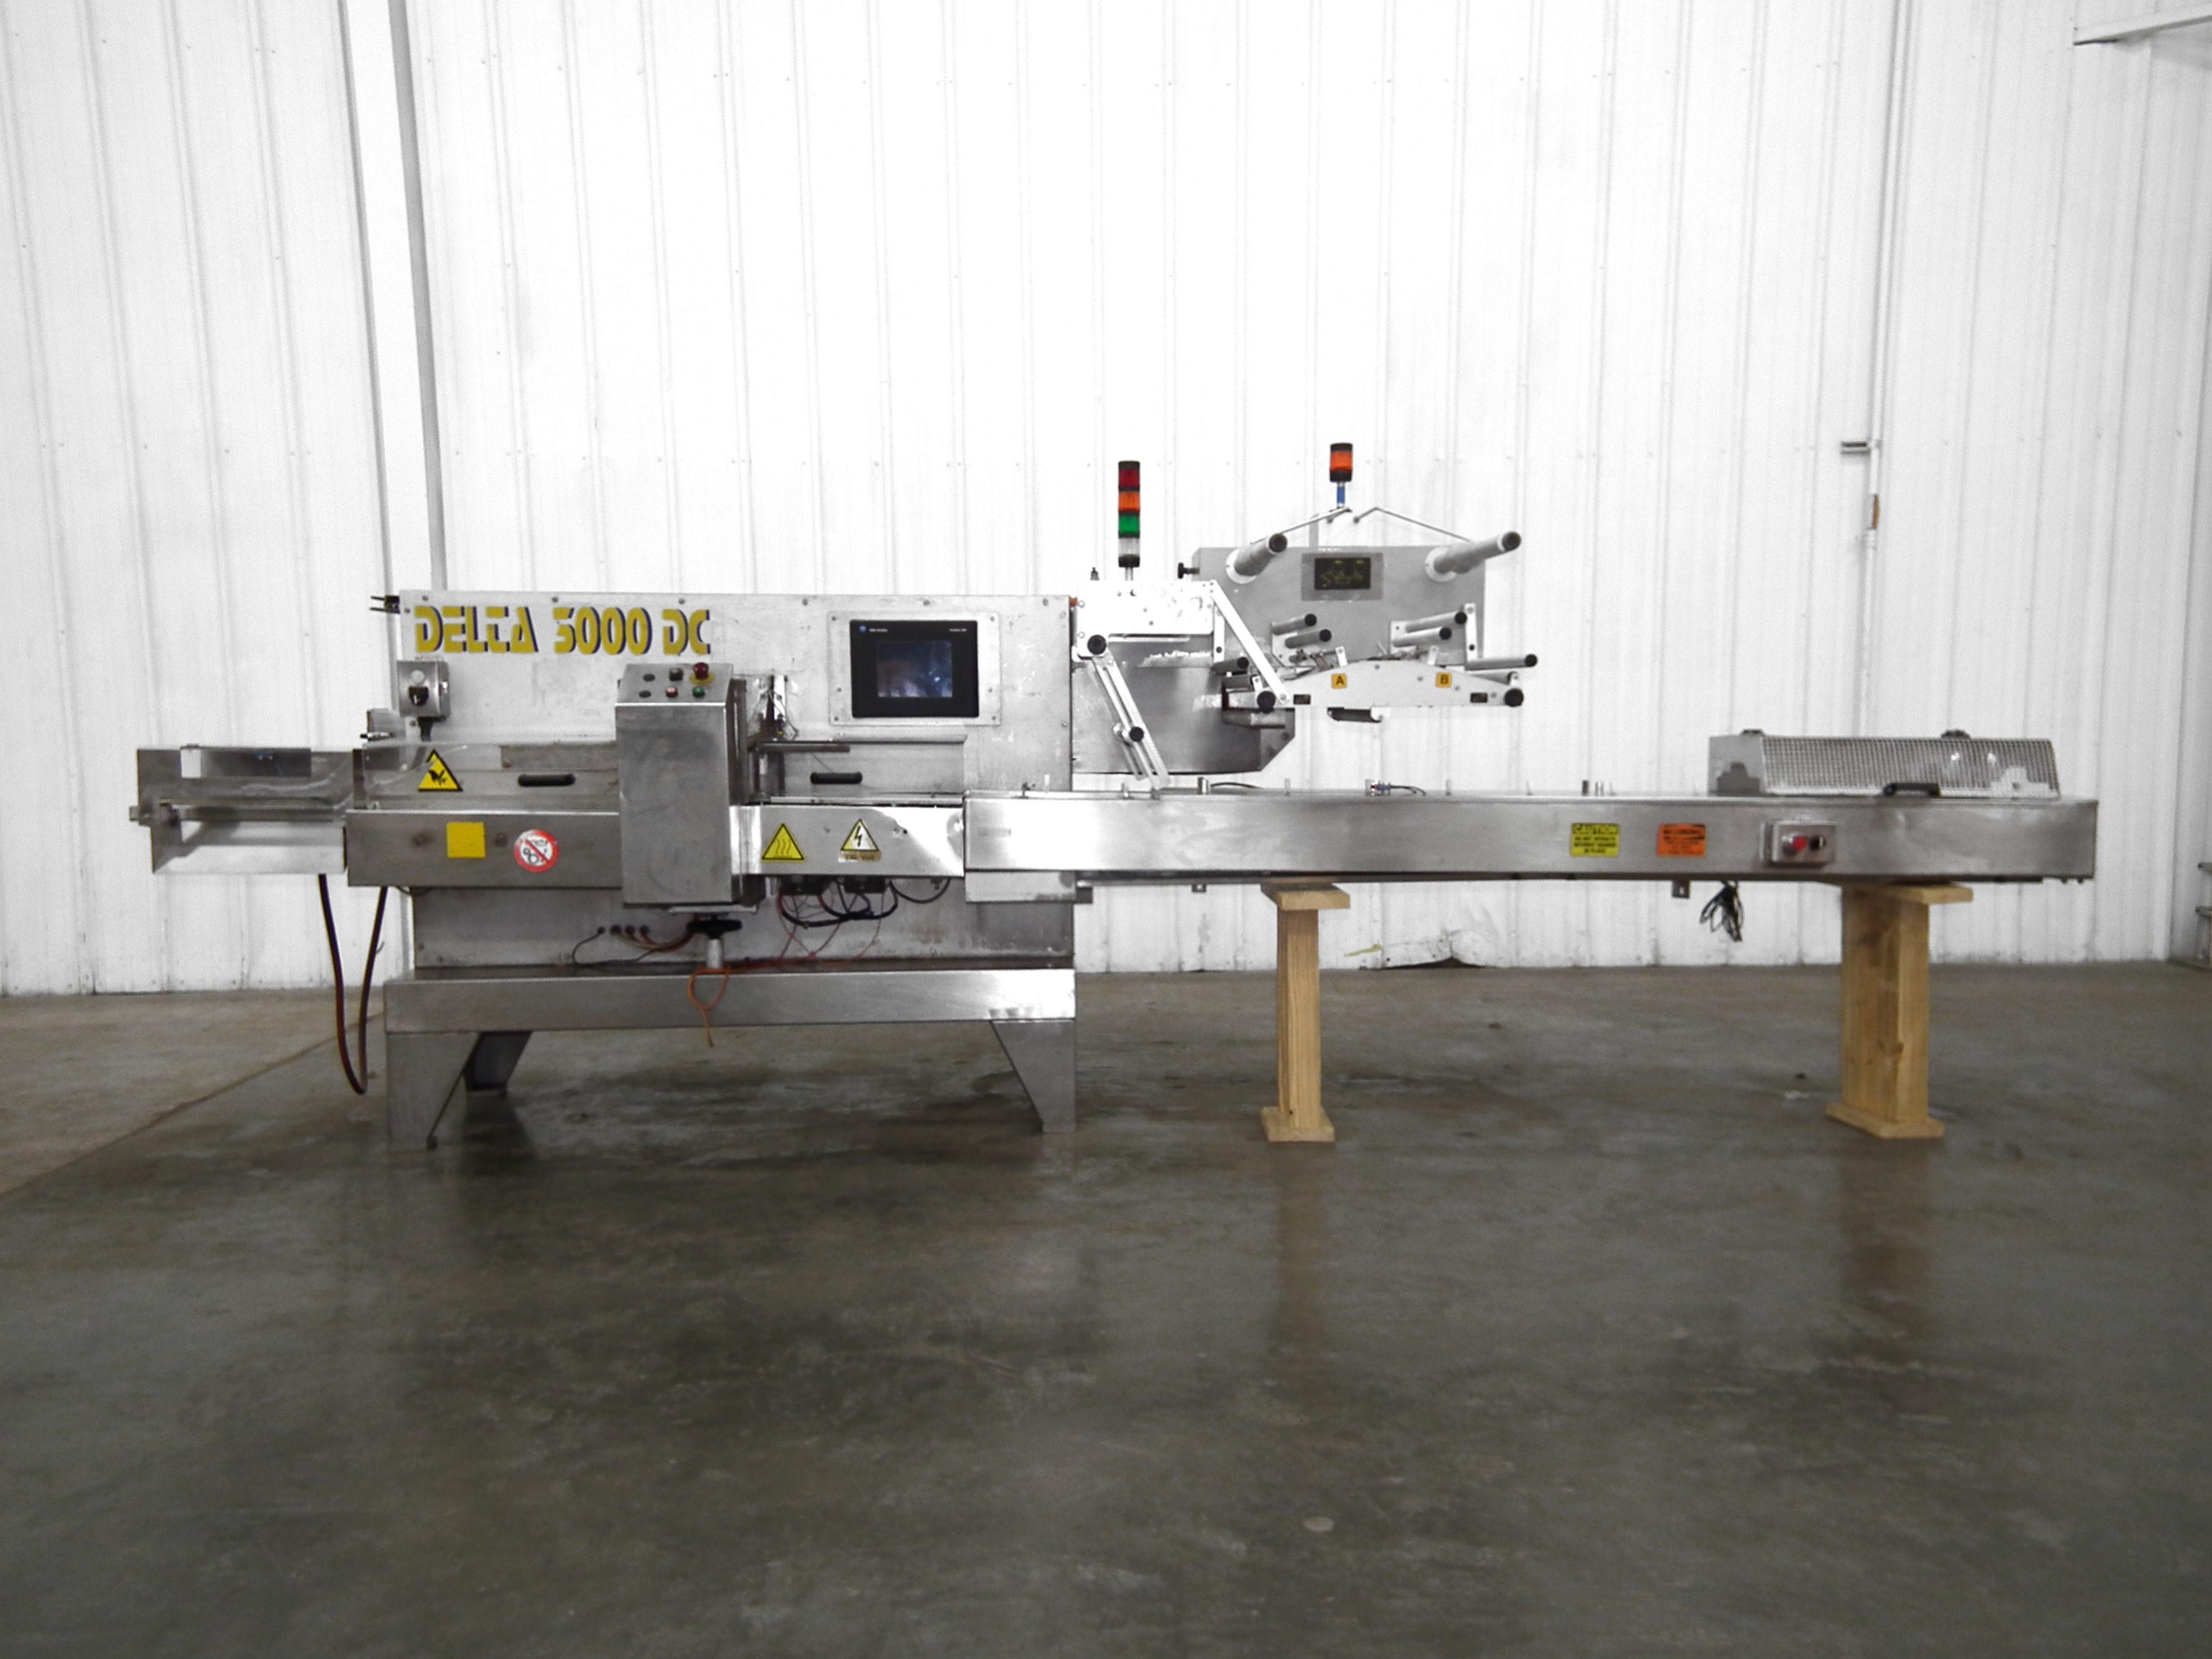 Ilapak Delta 3000 DC Wide Frame Wrapper B4825